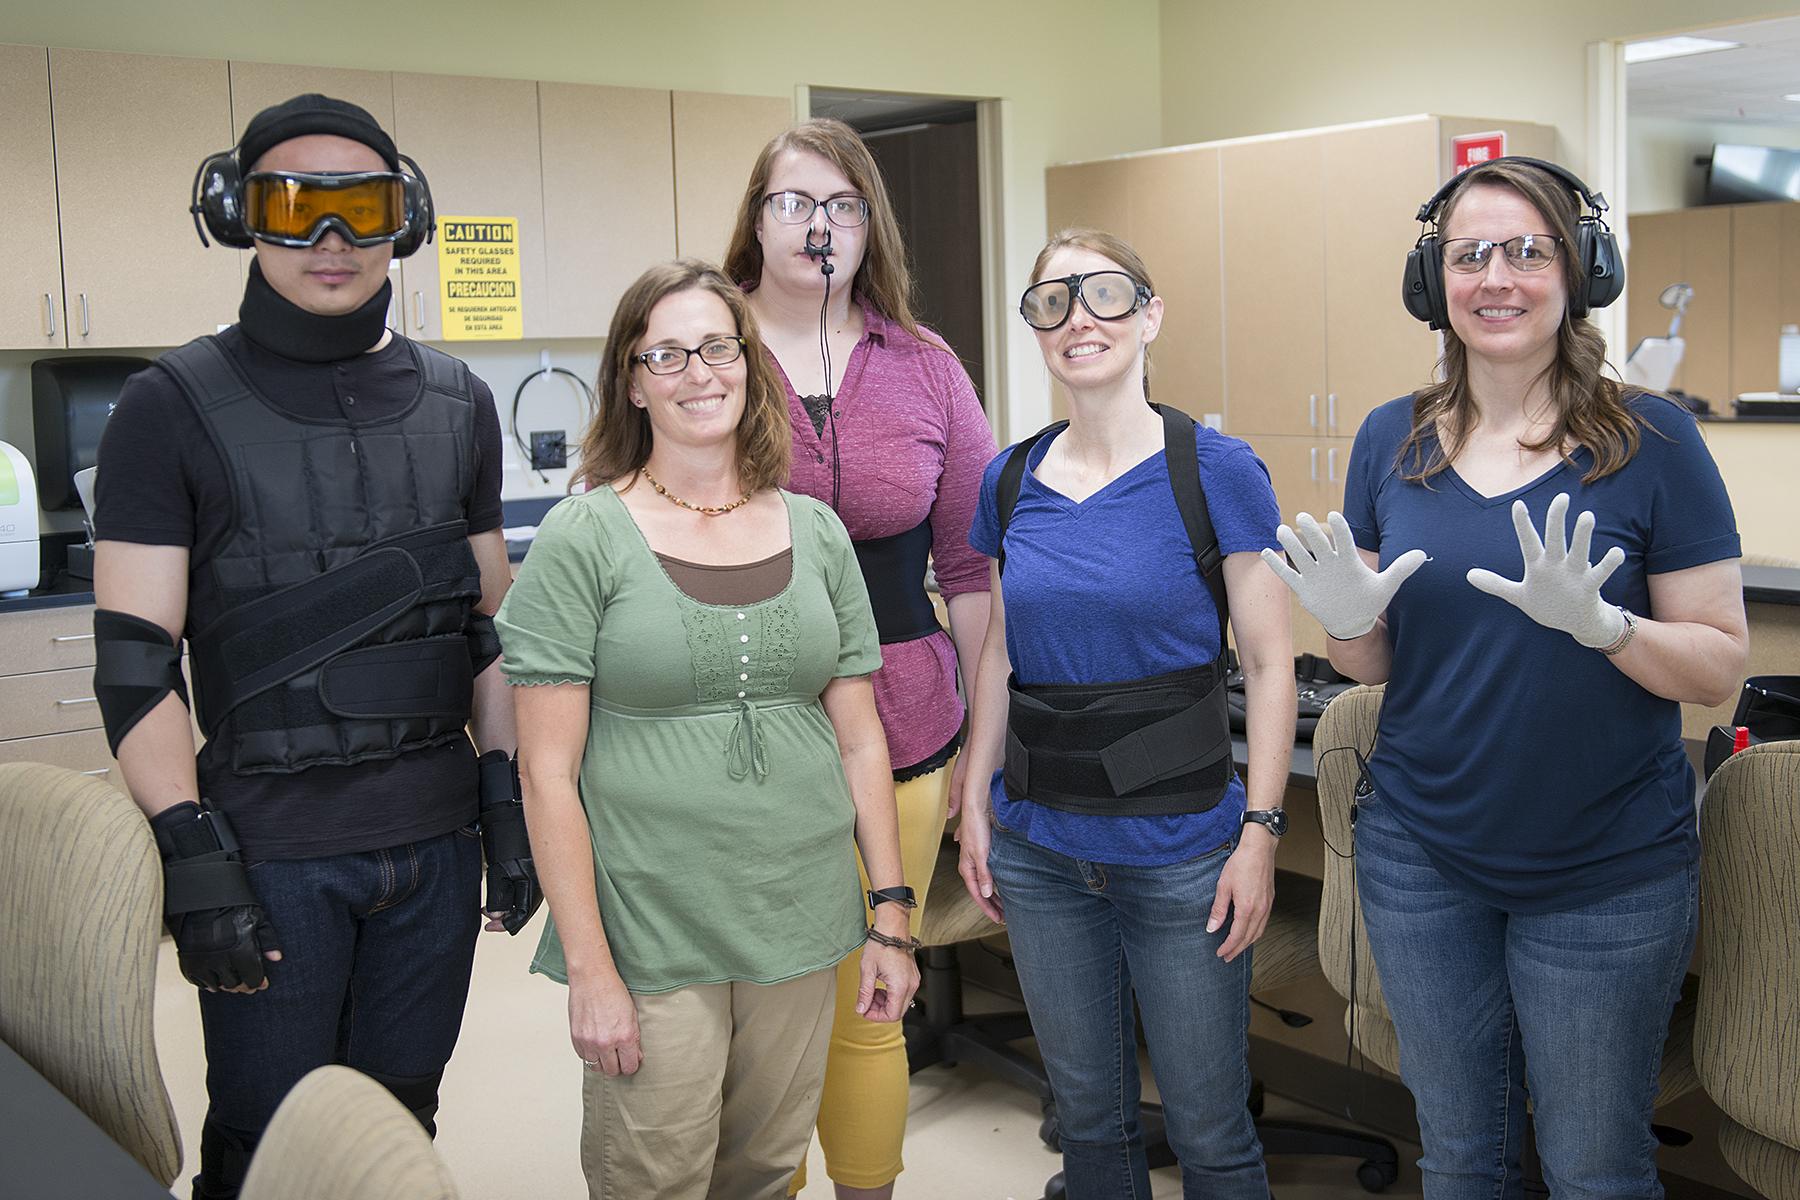 NTC Community members testing age simulation equipment